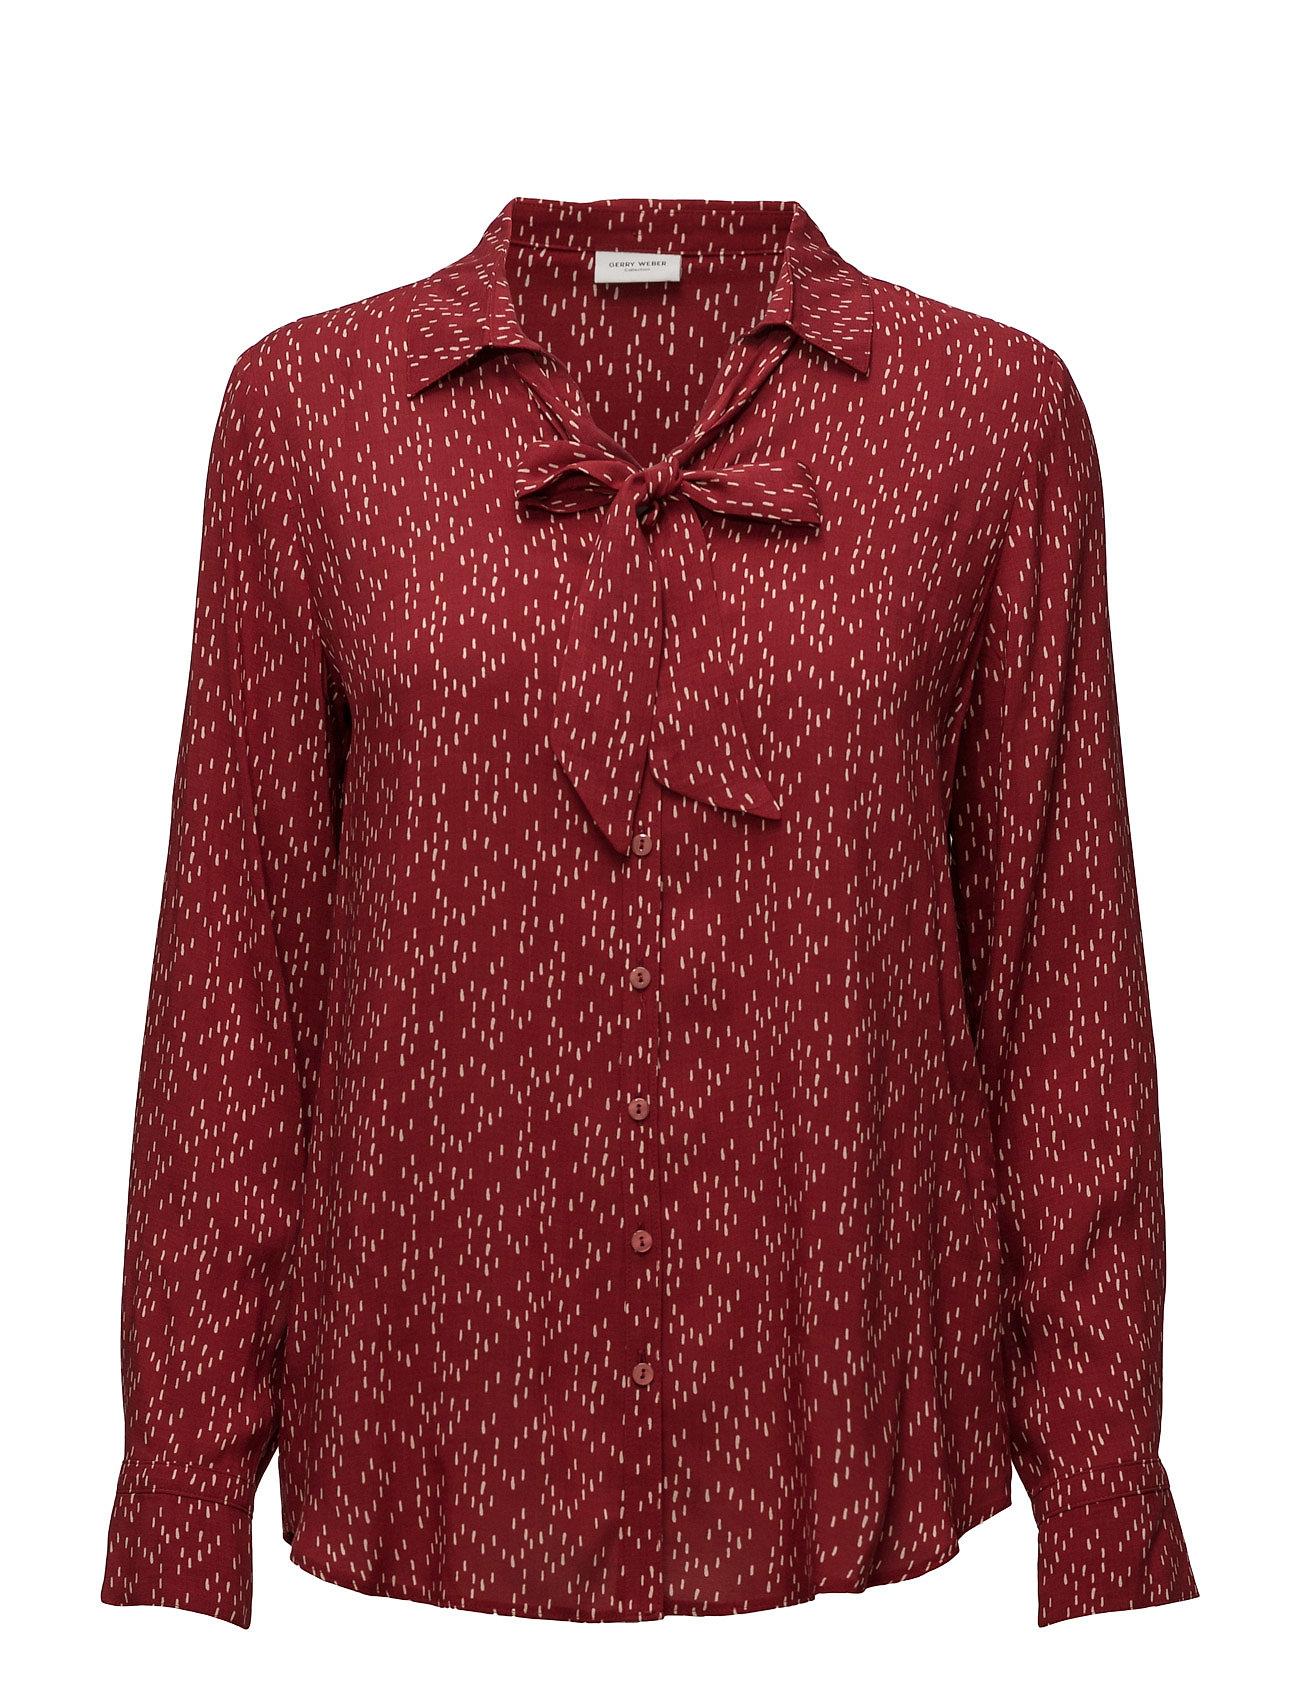 blouse long sleeve brick ecru print kr gerry weber. Black Bedroom Furniture Sets. Home Design Ideas